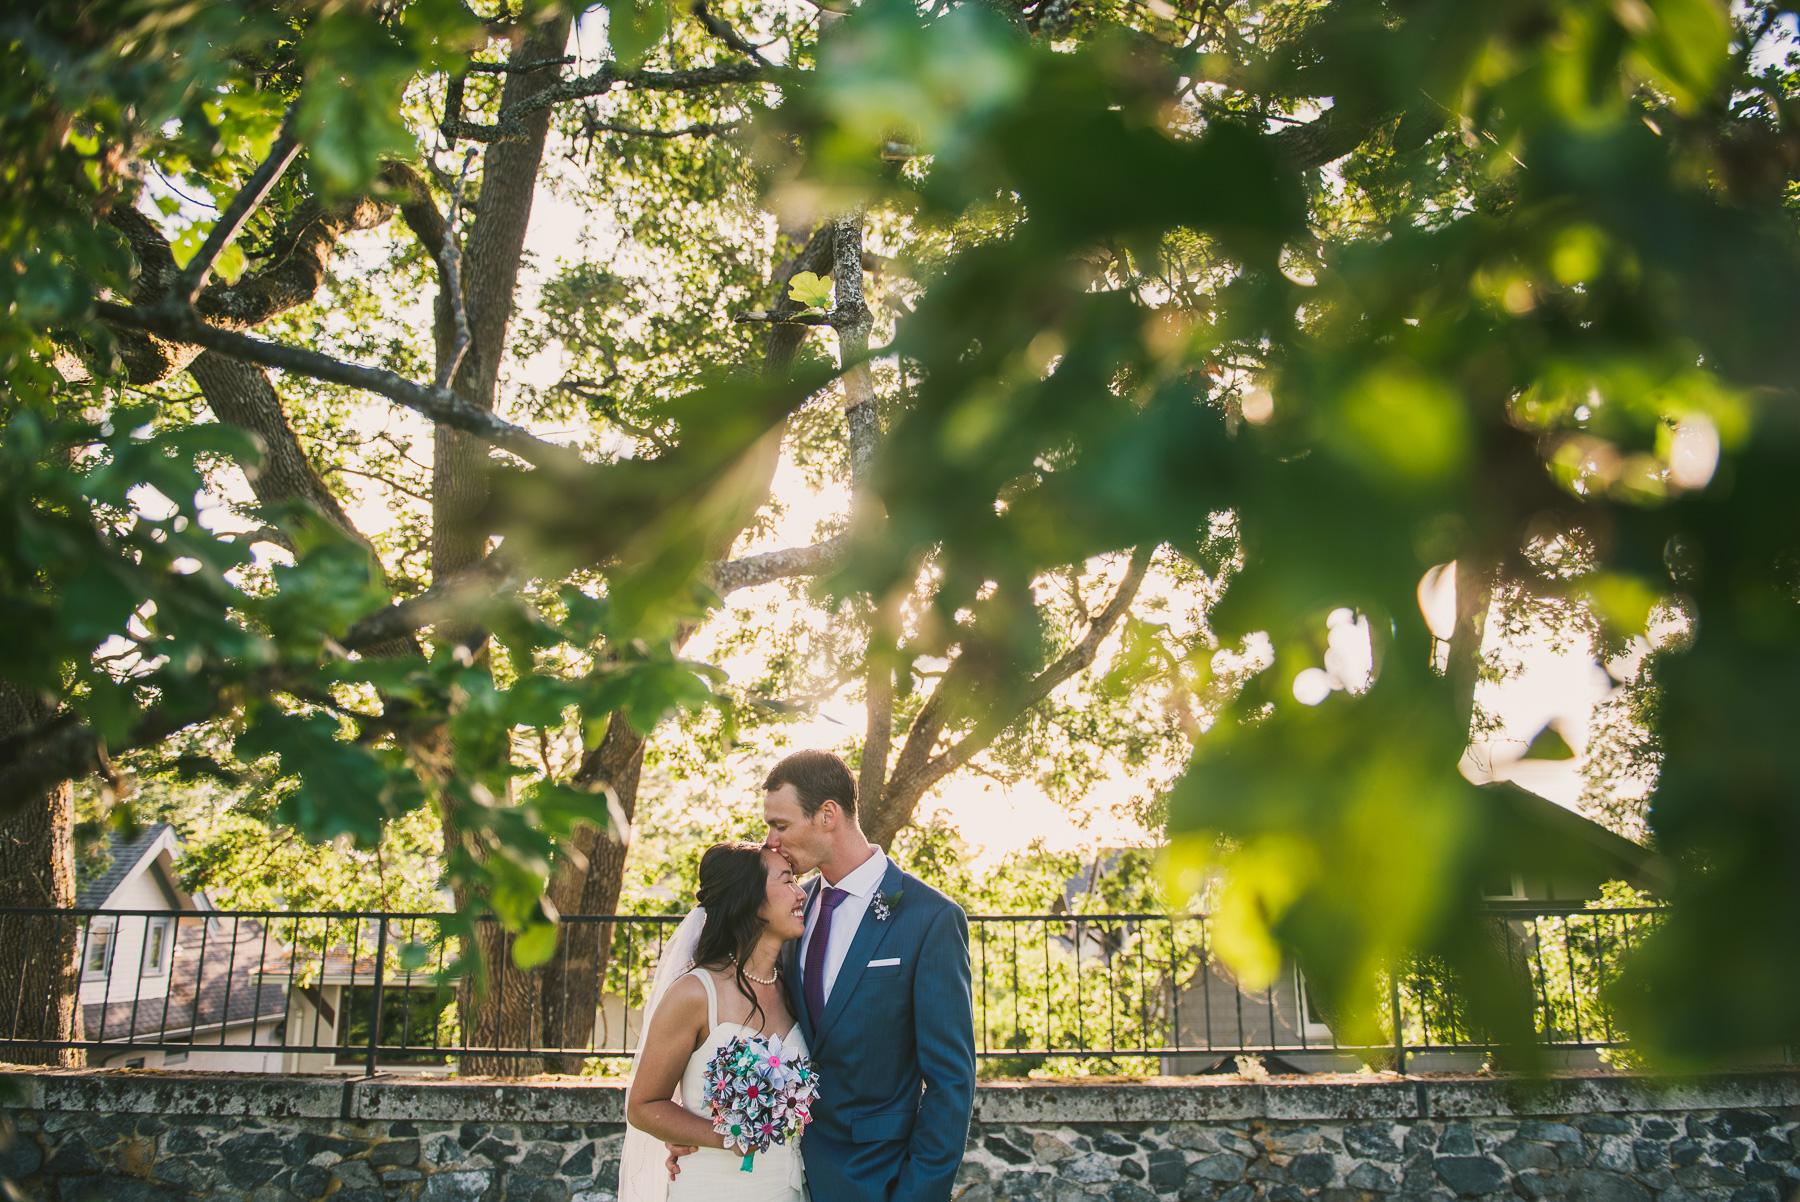 Victoria-BC-Wedding-Photography-176.jpg